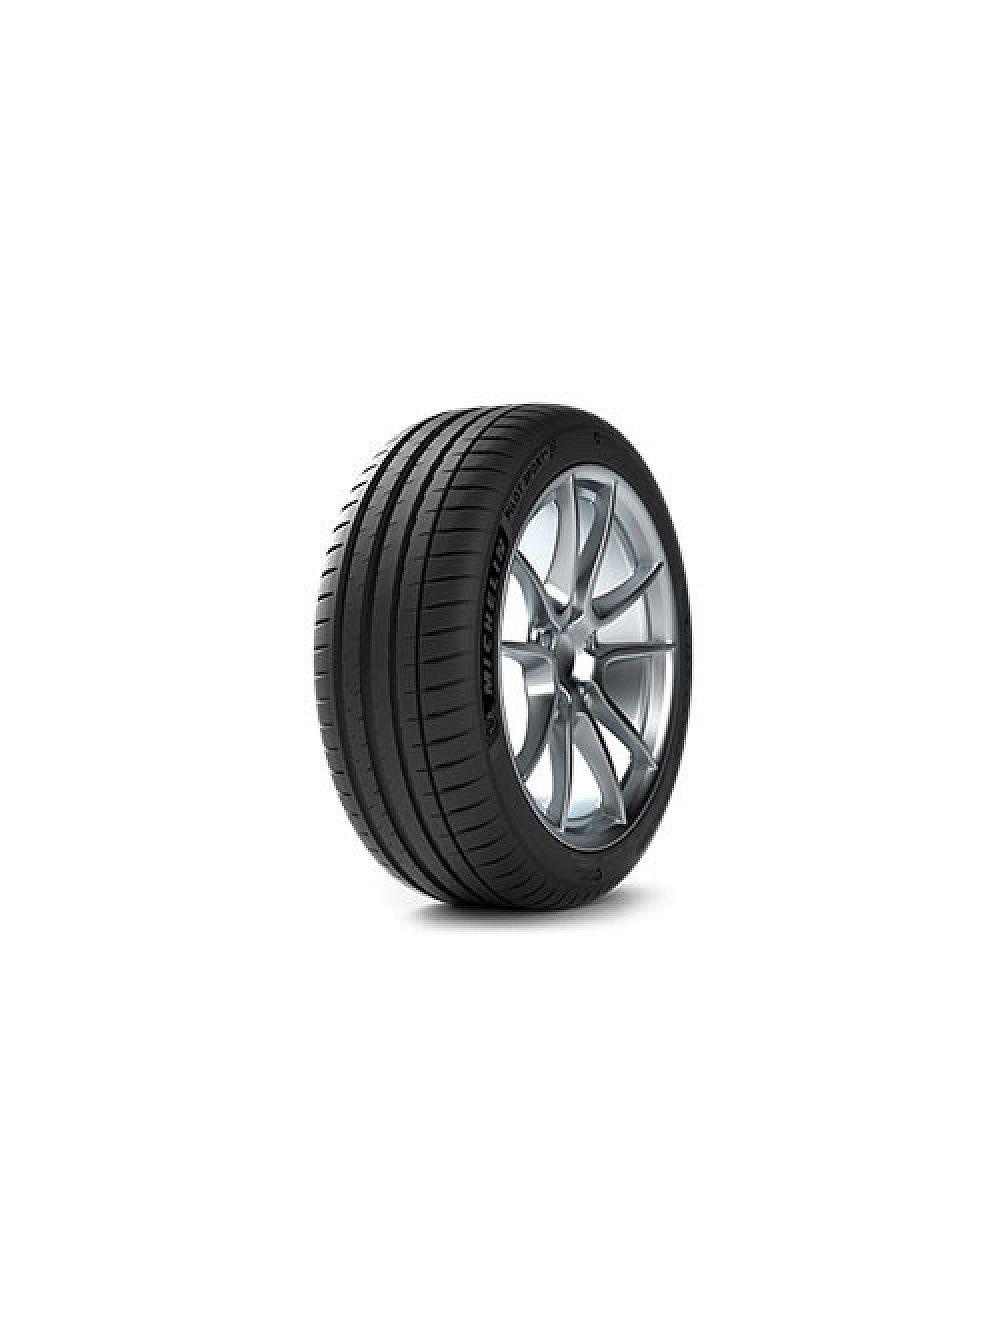 Michelin 315/30R21 Y Pilot Sport4 S XL MO1 Nyári gumi